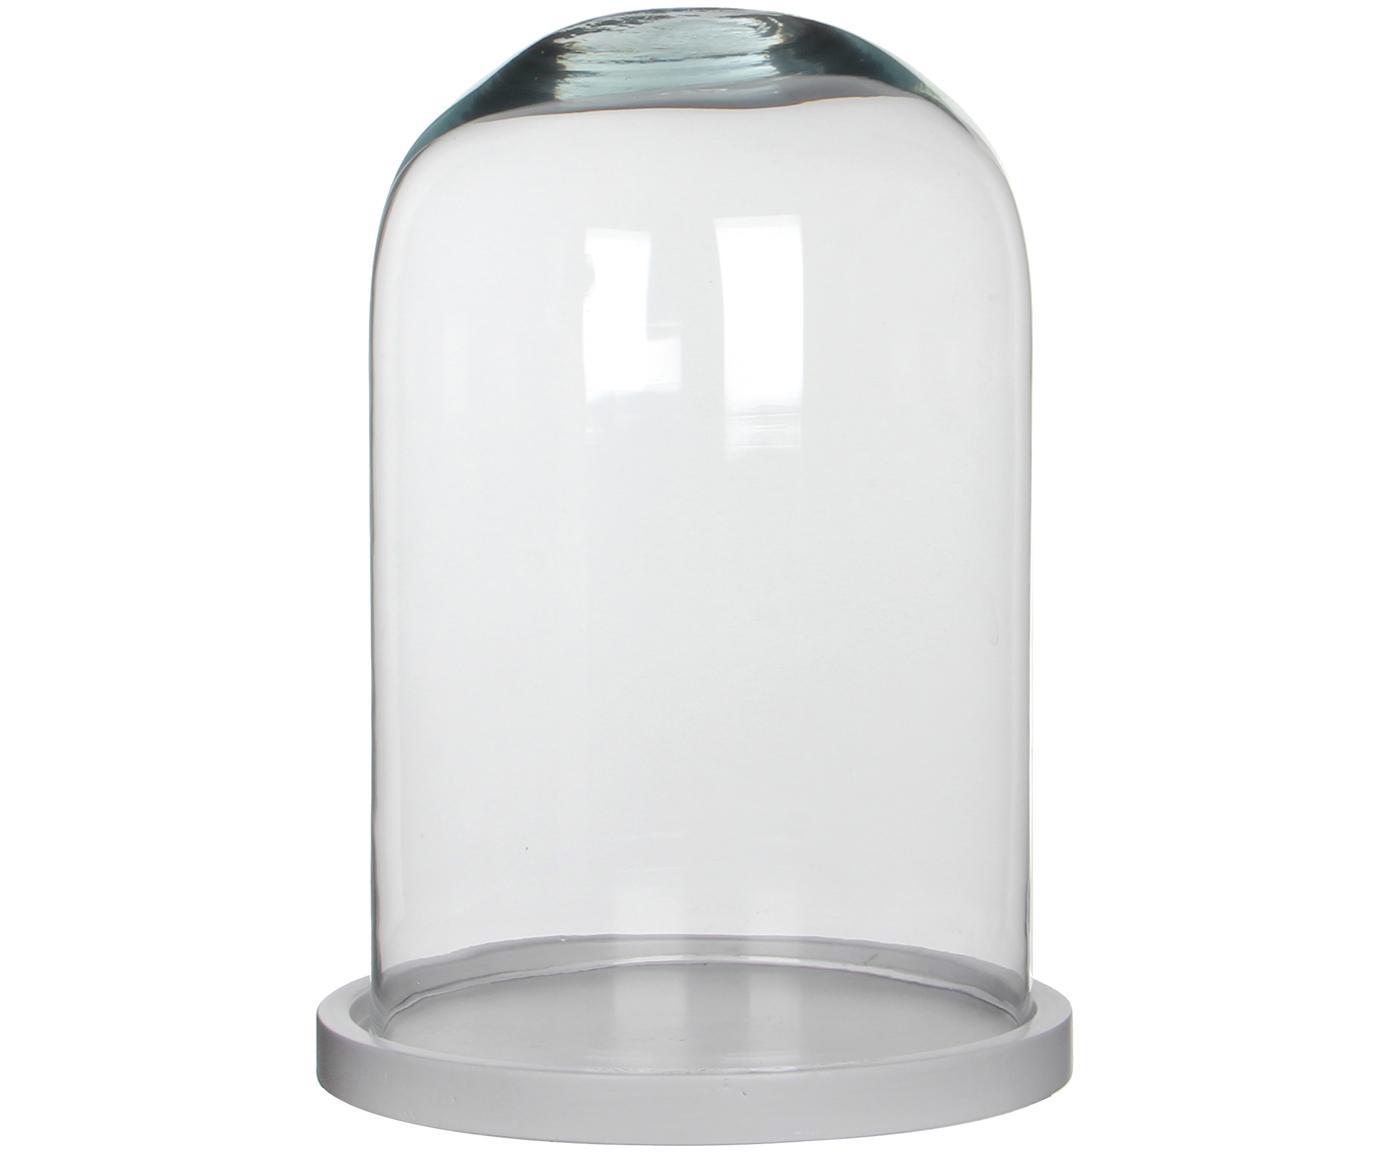 Glazen stolp Hella, Stolp: glas, Onderzetter: gelakt hout, Stolp: transparant. Onderzetter: wit, Ø 22 x H 30 cm